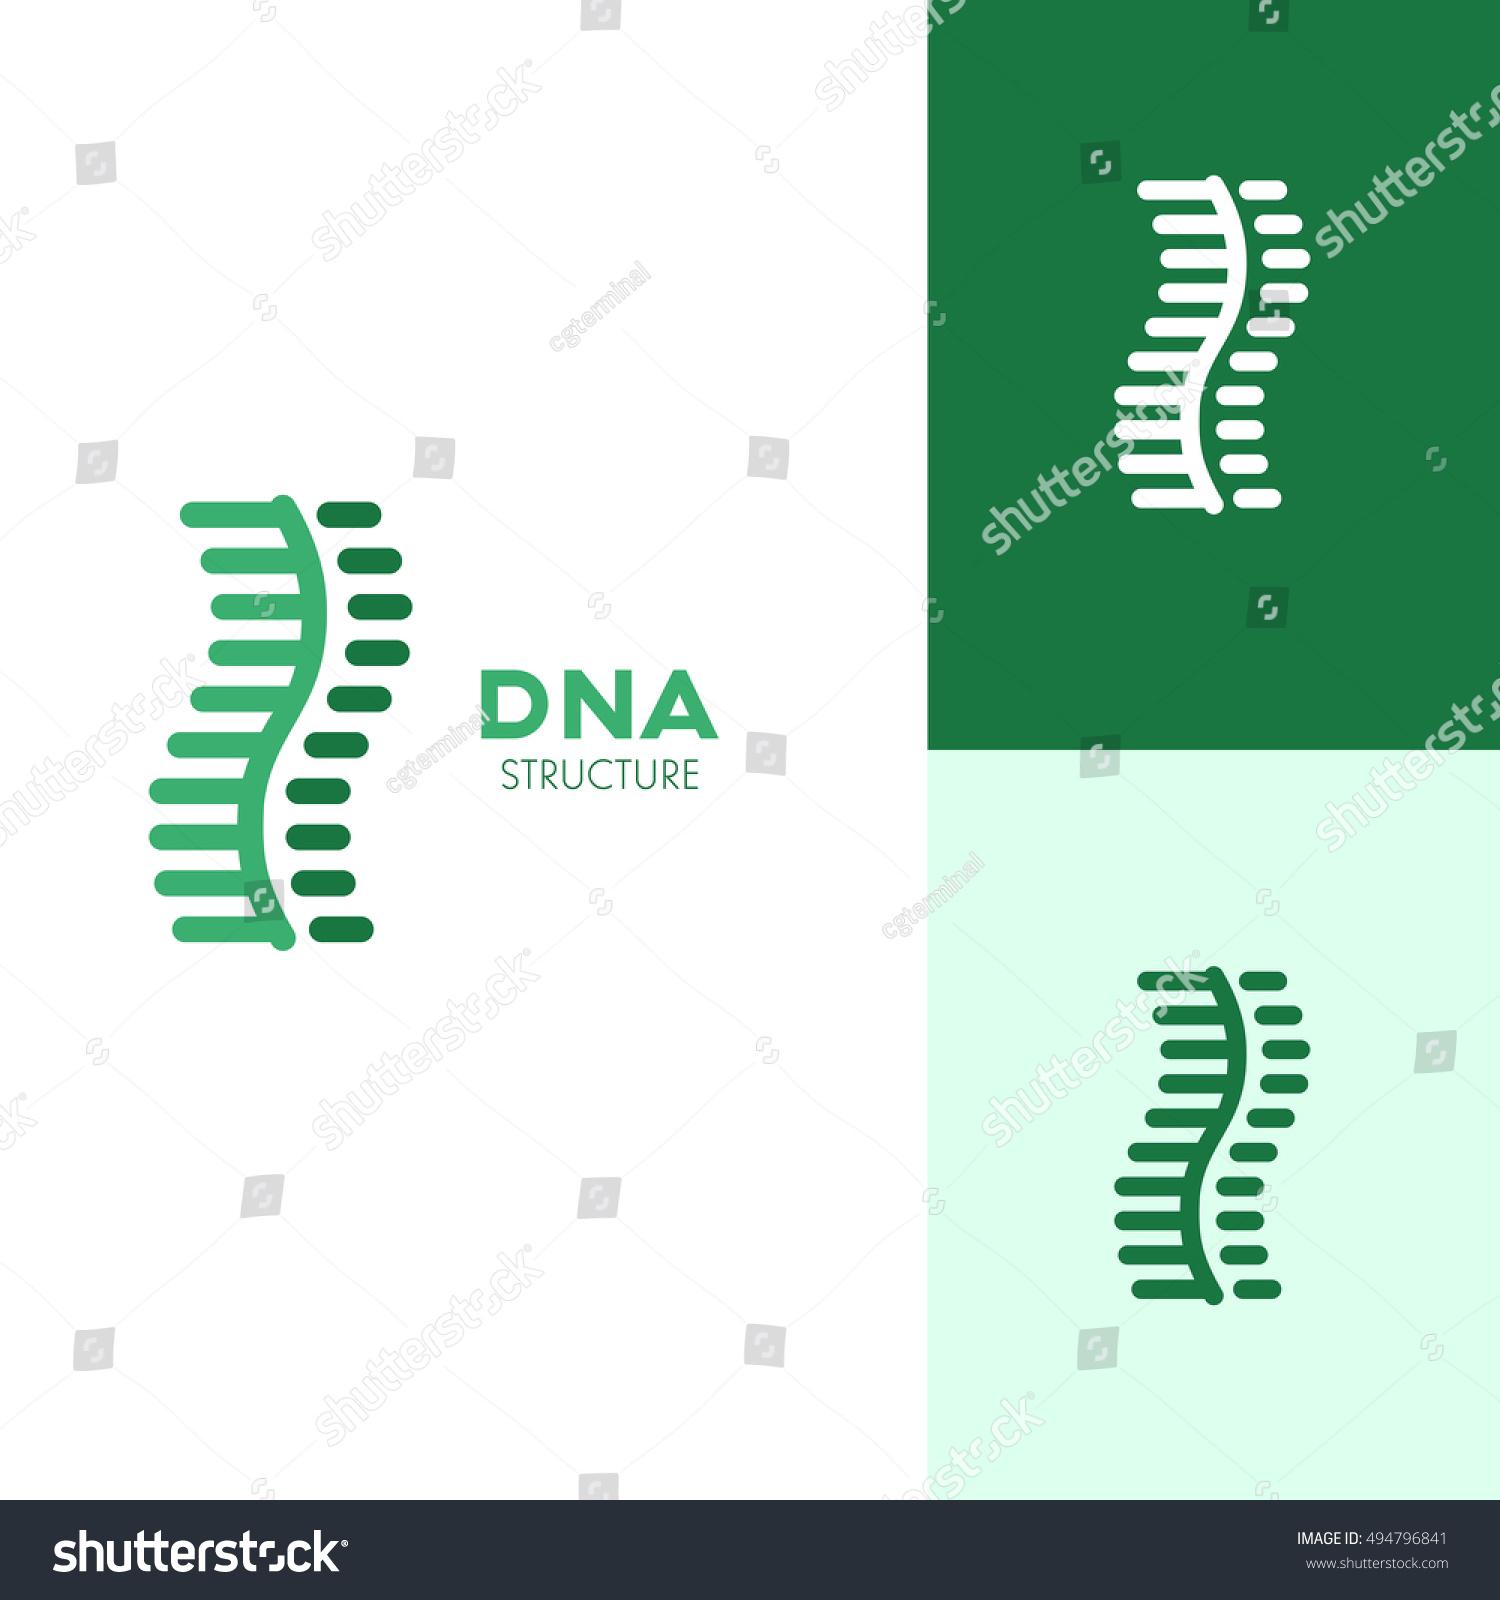 Structure Dna Icon Logo Template Medicine Stock Vector 494796841